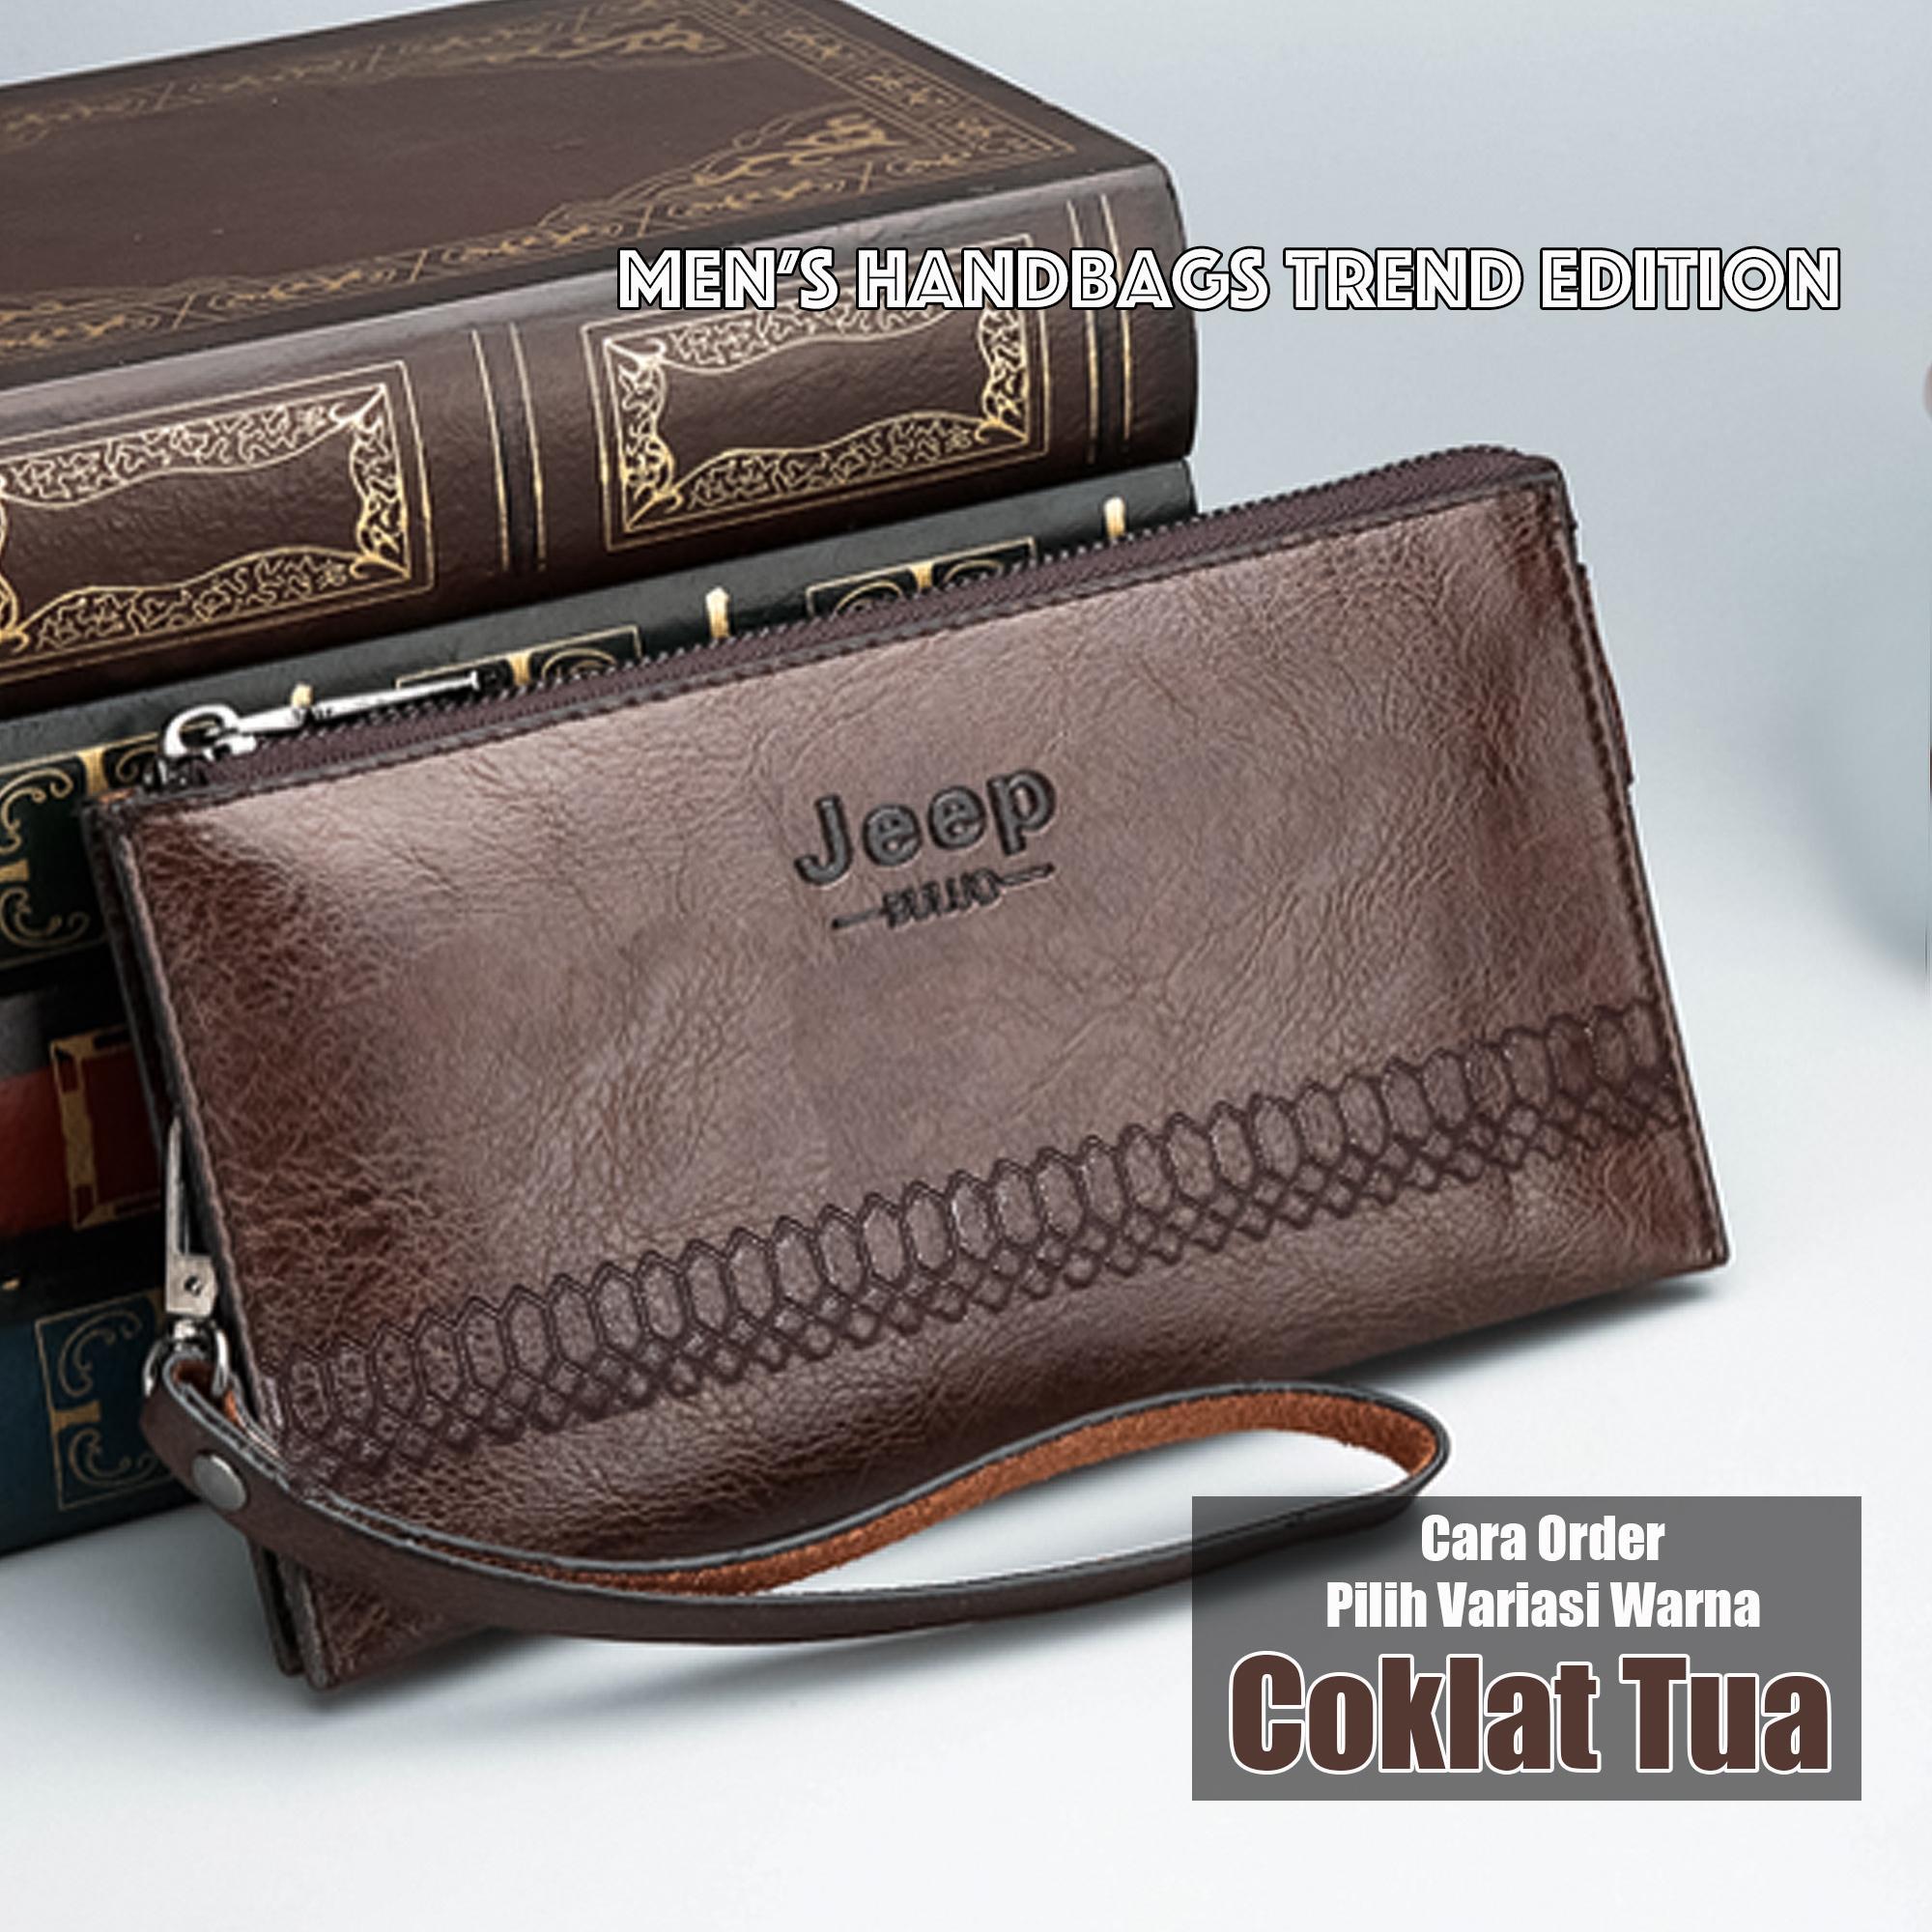 Tas Tangan Import Hand Bag Dompet Panjang Tas Pria Wanita Gaya Korea ( Jeep  - A023 d2d78a7f89